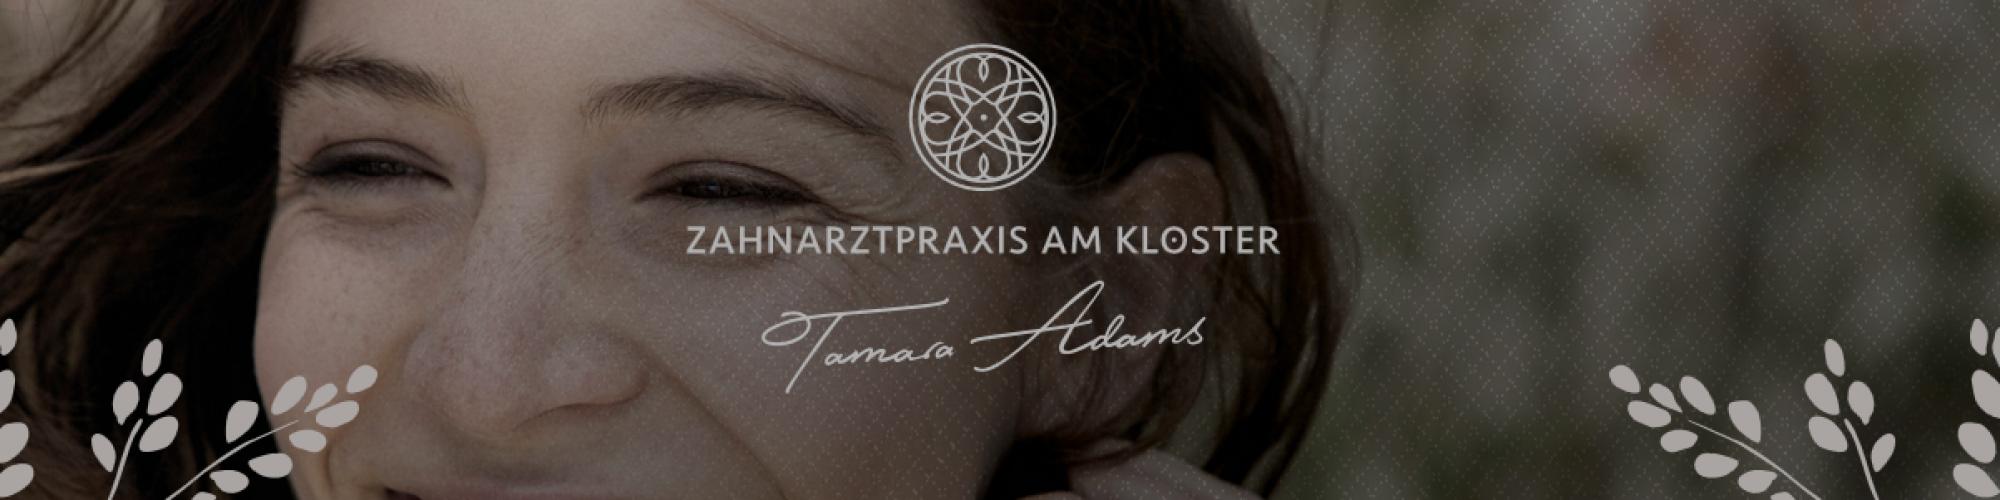 Zahnarztpraxis Tamara Adams